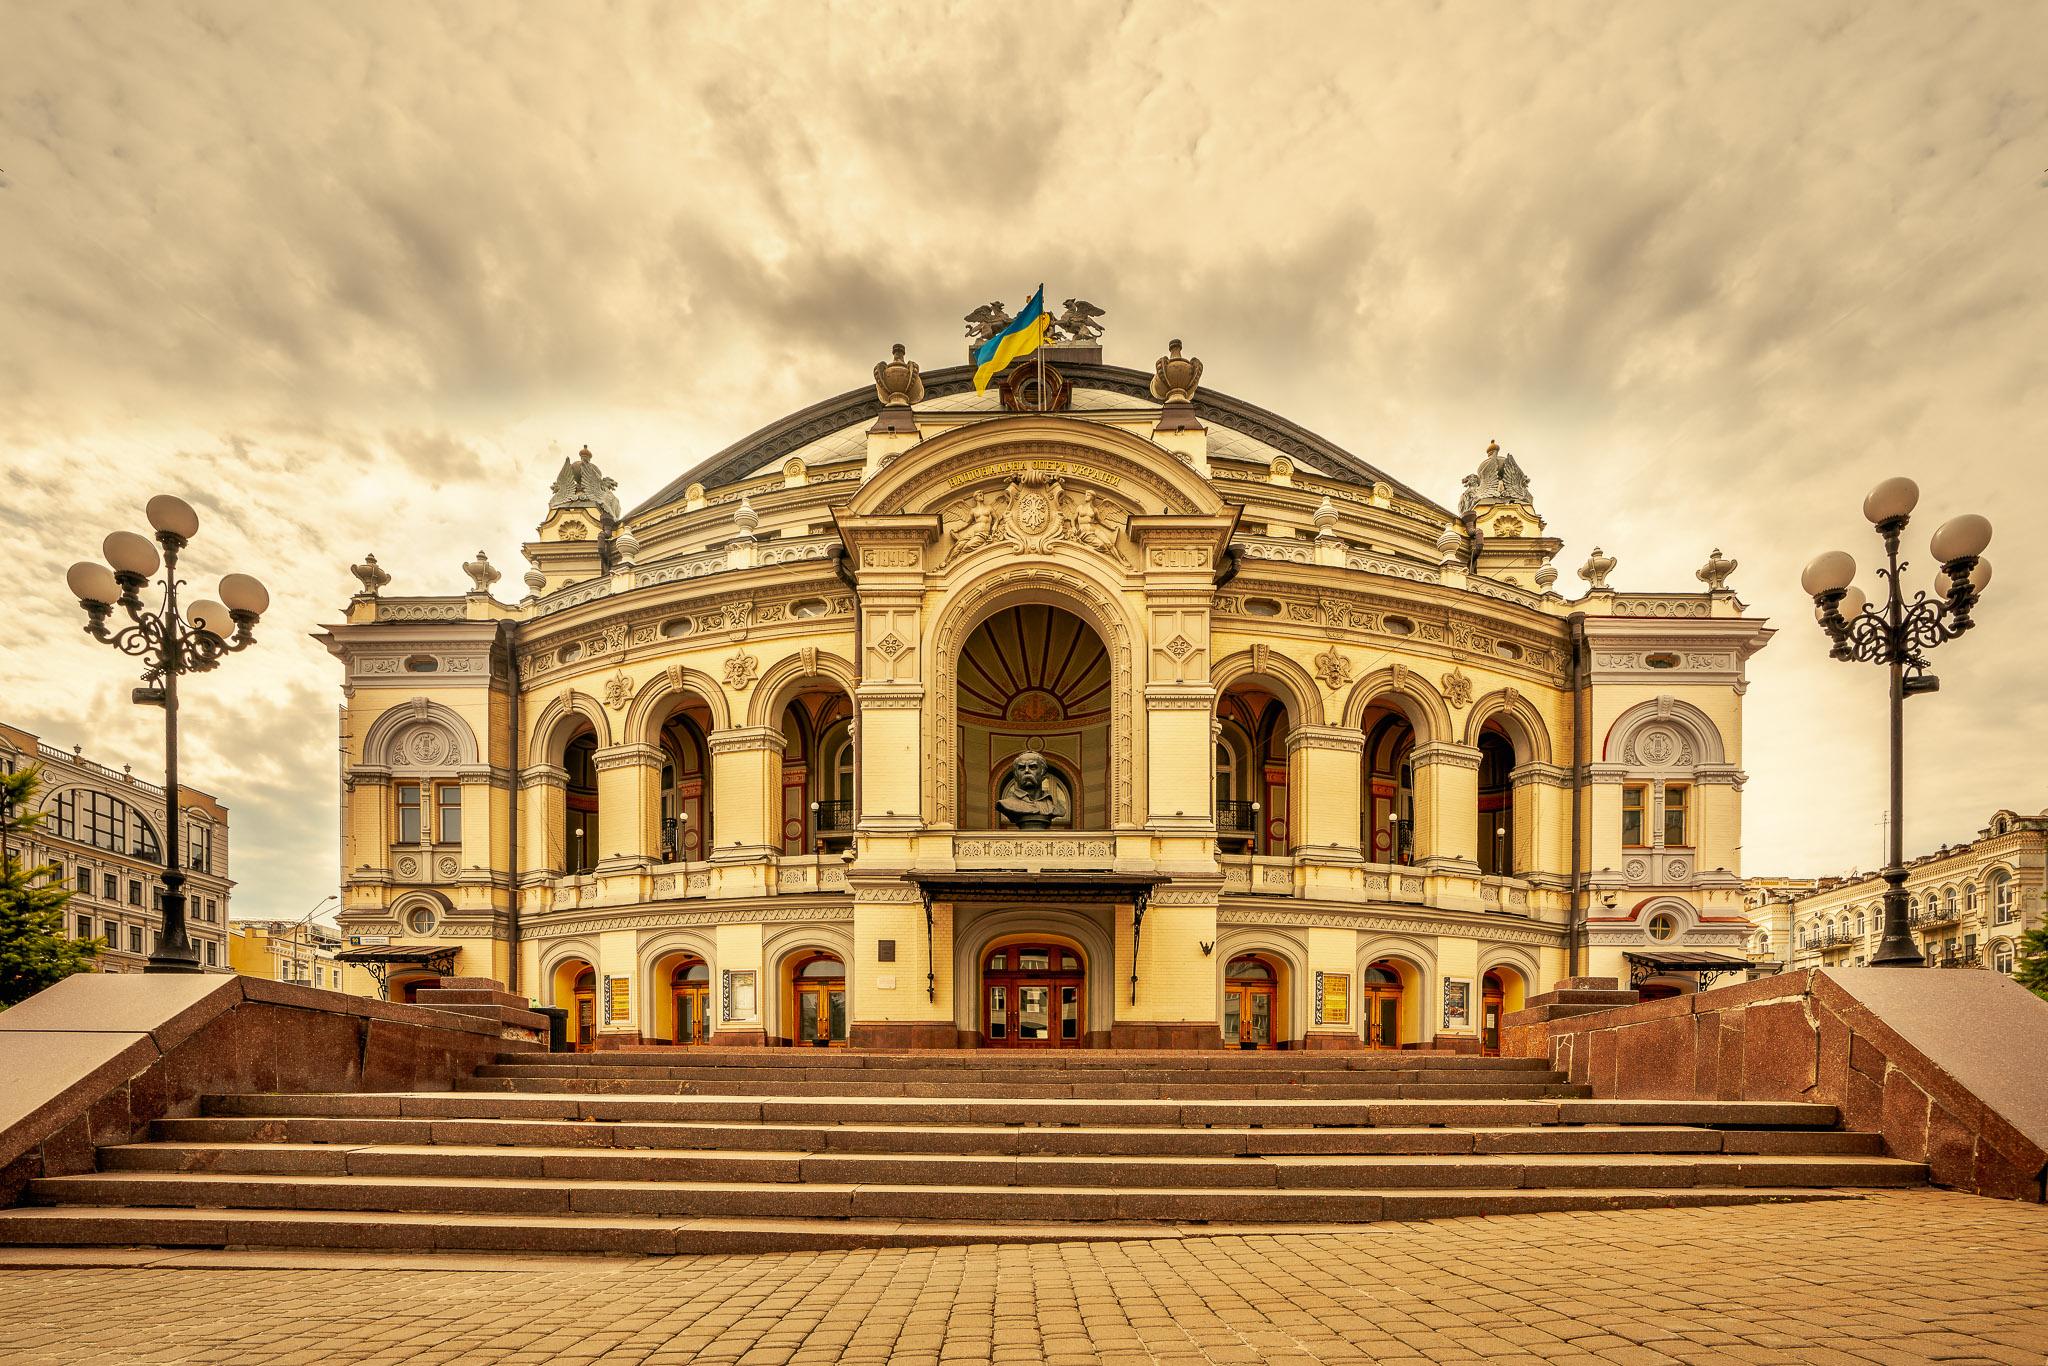 Kyiv's Opera House